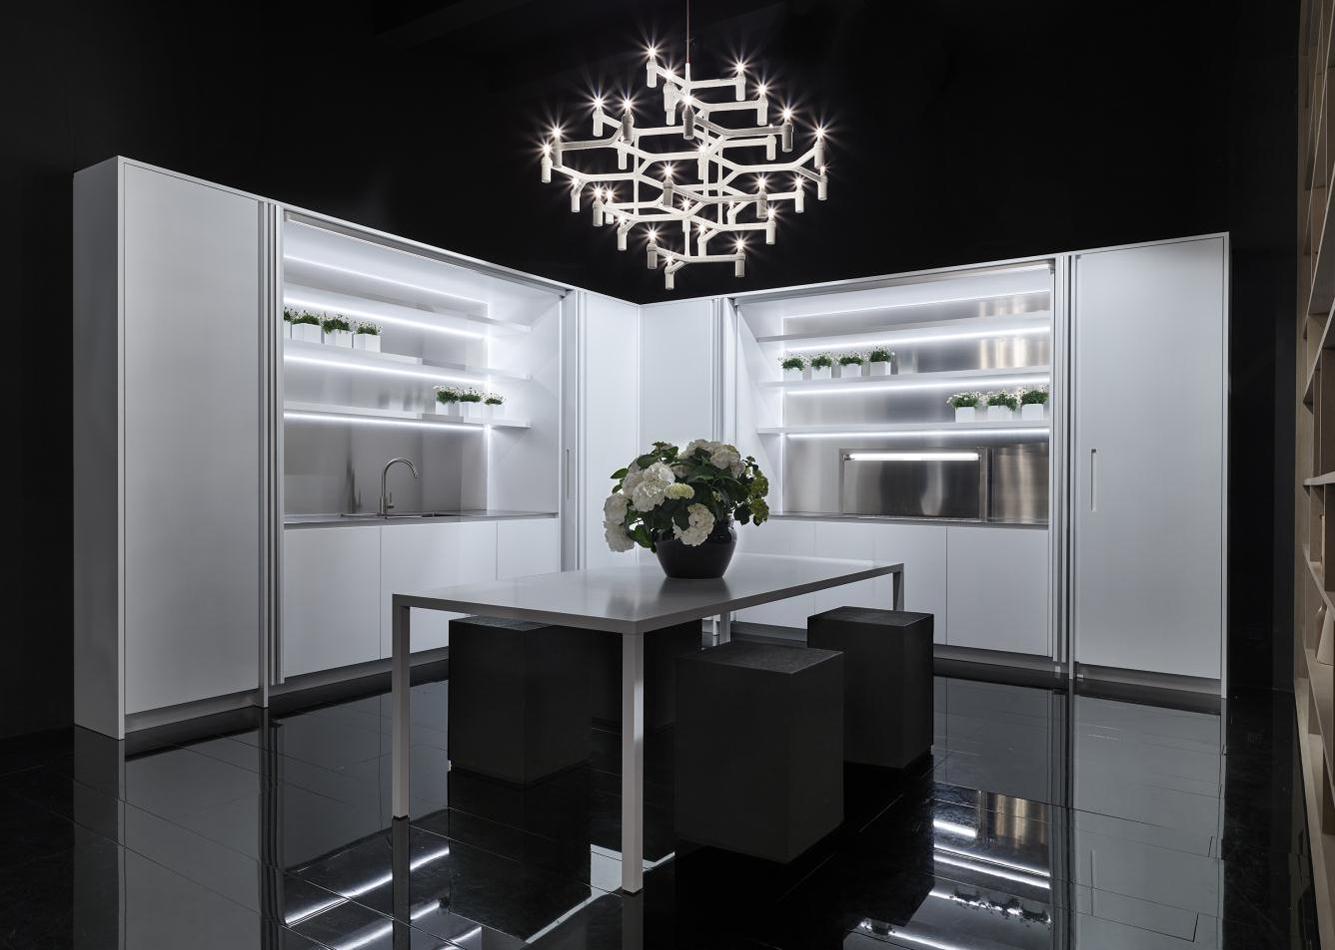 Cucine eleganti elegant rivenditori cucine arrex roma - Mobili colombini opinioni ...